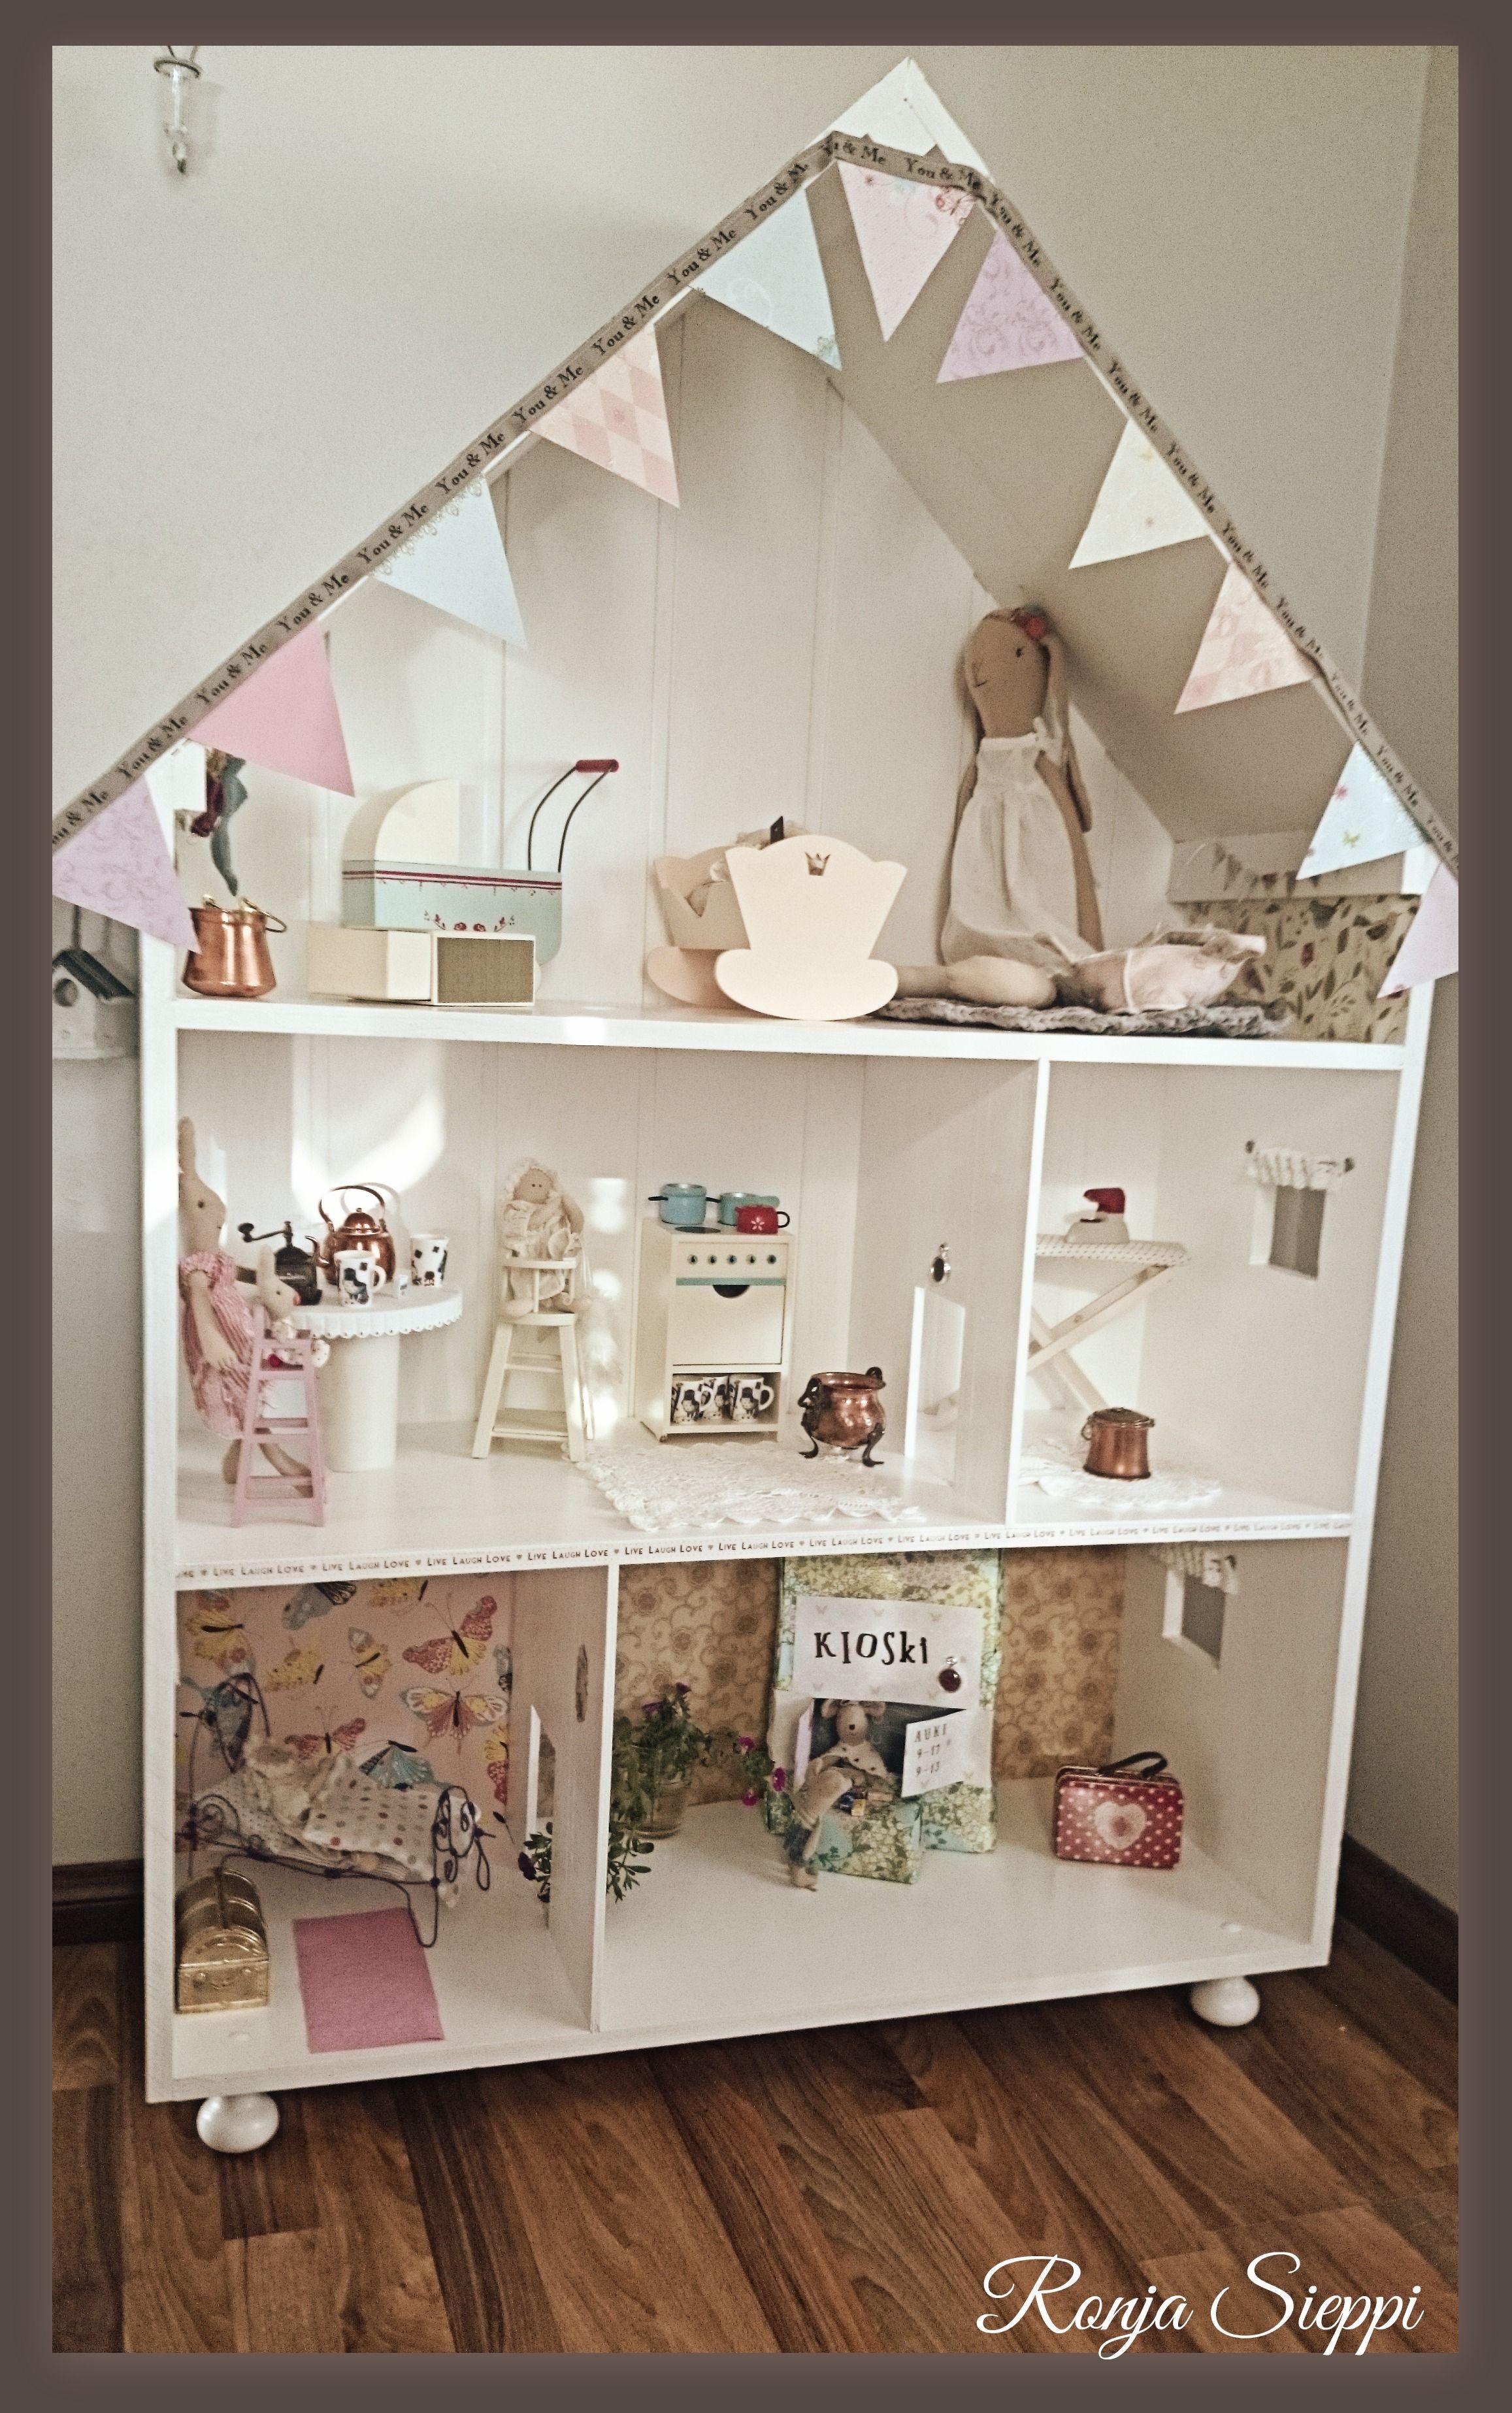 maileg house puppenhaus pinterest puppenstube diy puppenhaus und puppen. Black Bedroom Furniture Sets. Home Design Ideas